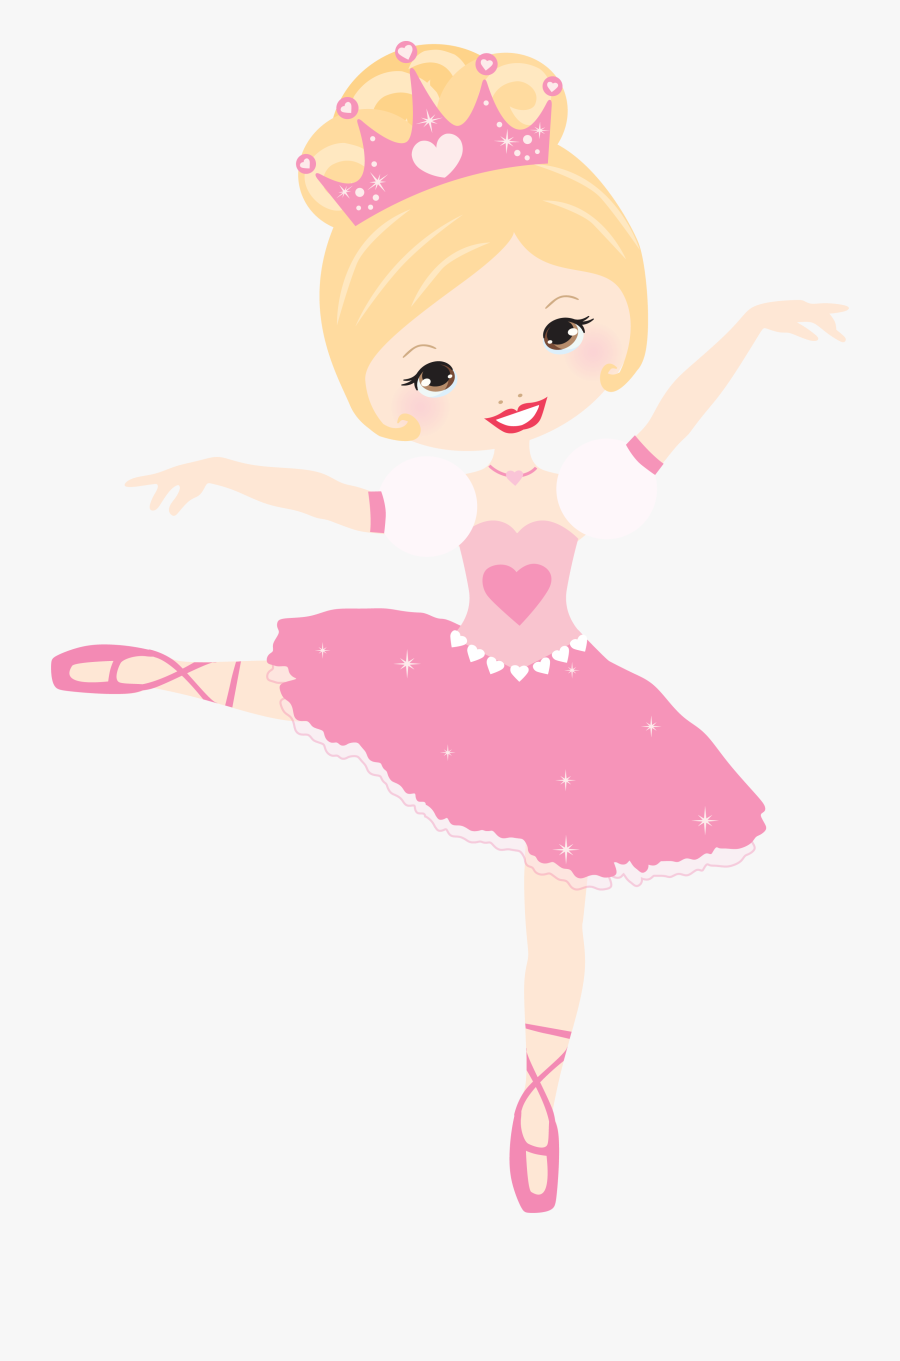 Sugar Plum The Nutcracker And The Mouse King Ballet - Ballet Dancer, Transparent Clipart